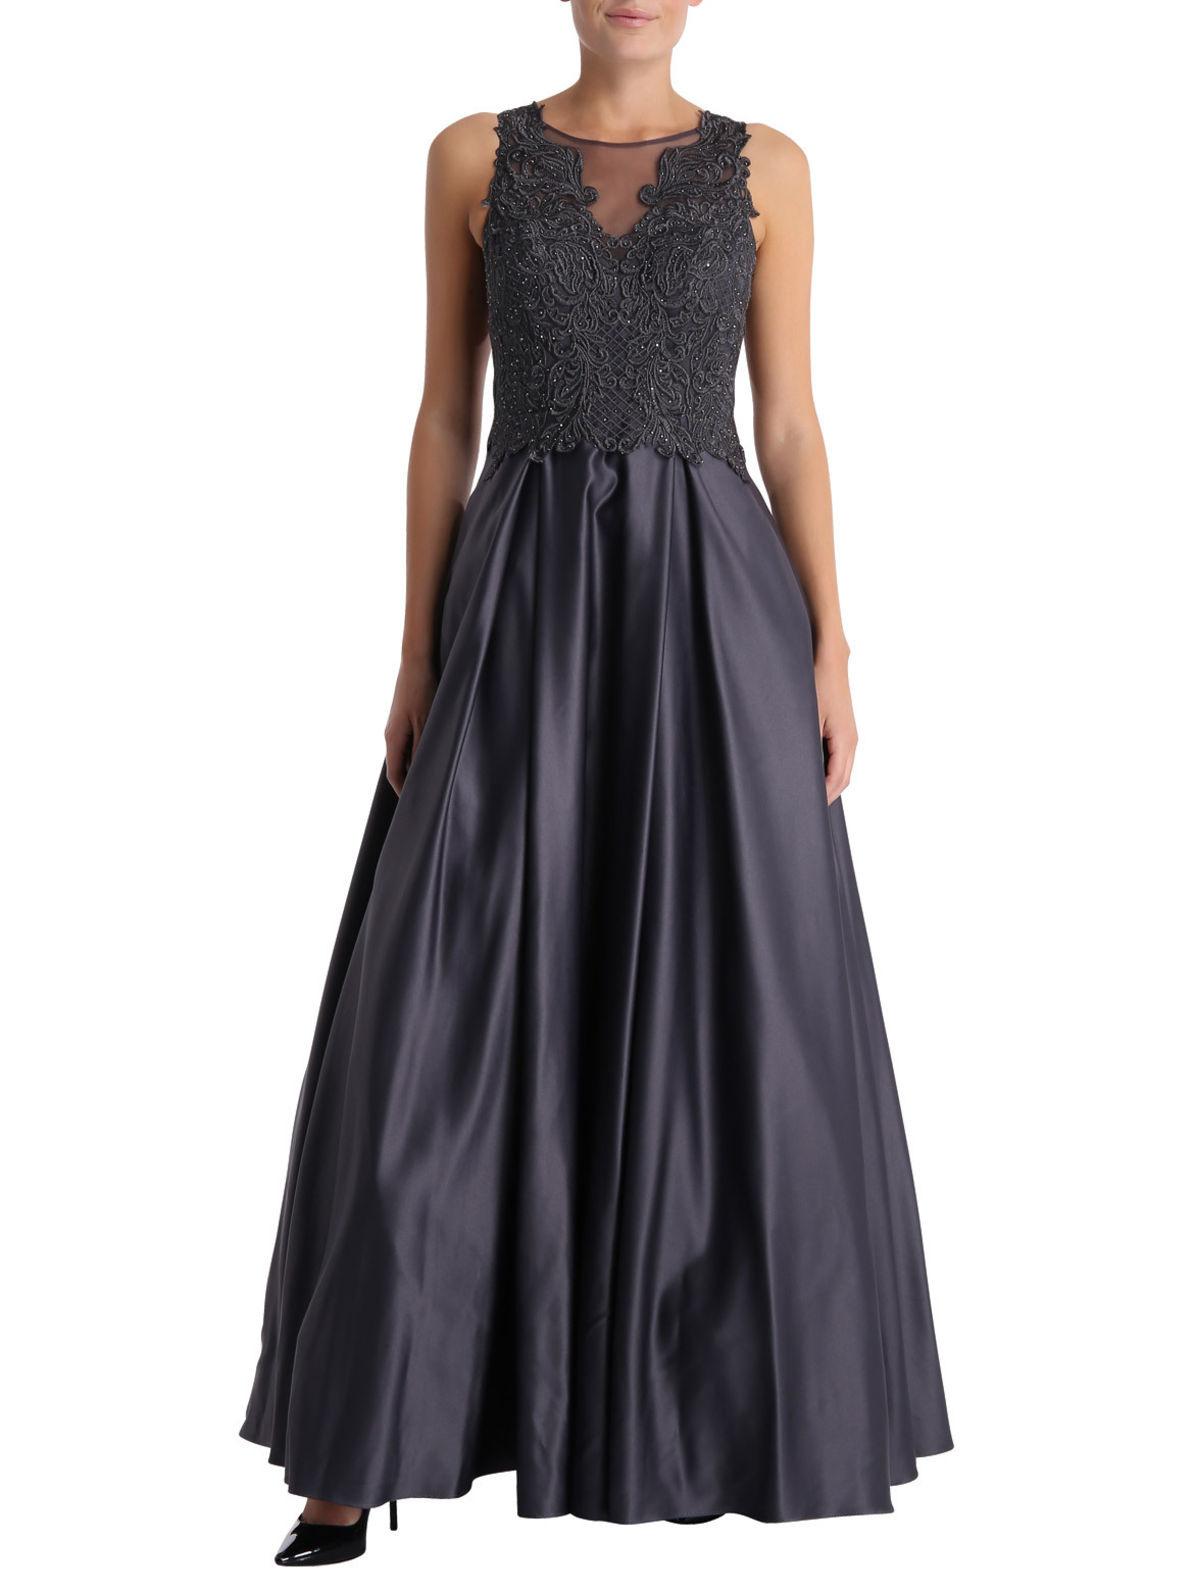 Designer Großartig V.M. Abendkleid SpezialgebietFormal Perfekt V.M. Abendkleid für 2019